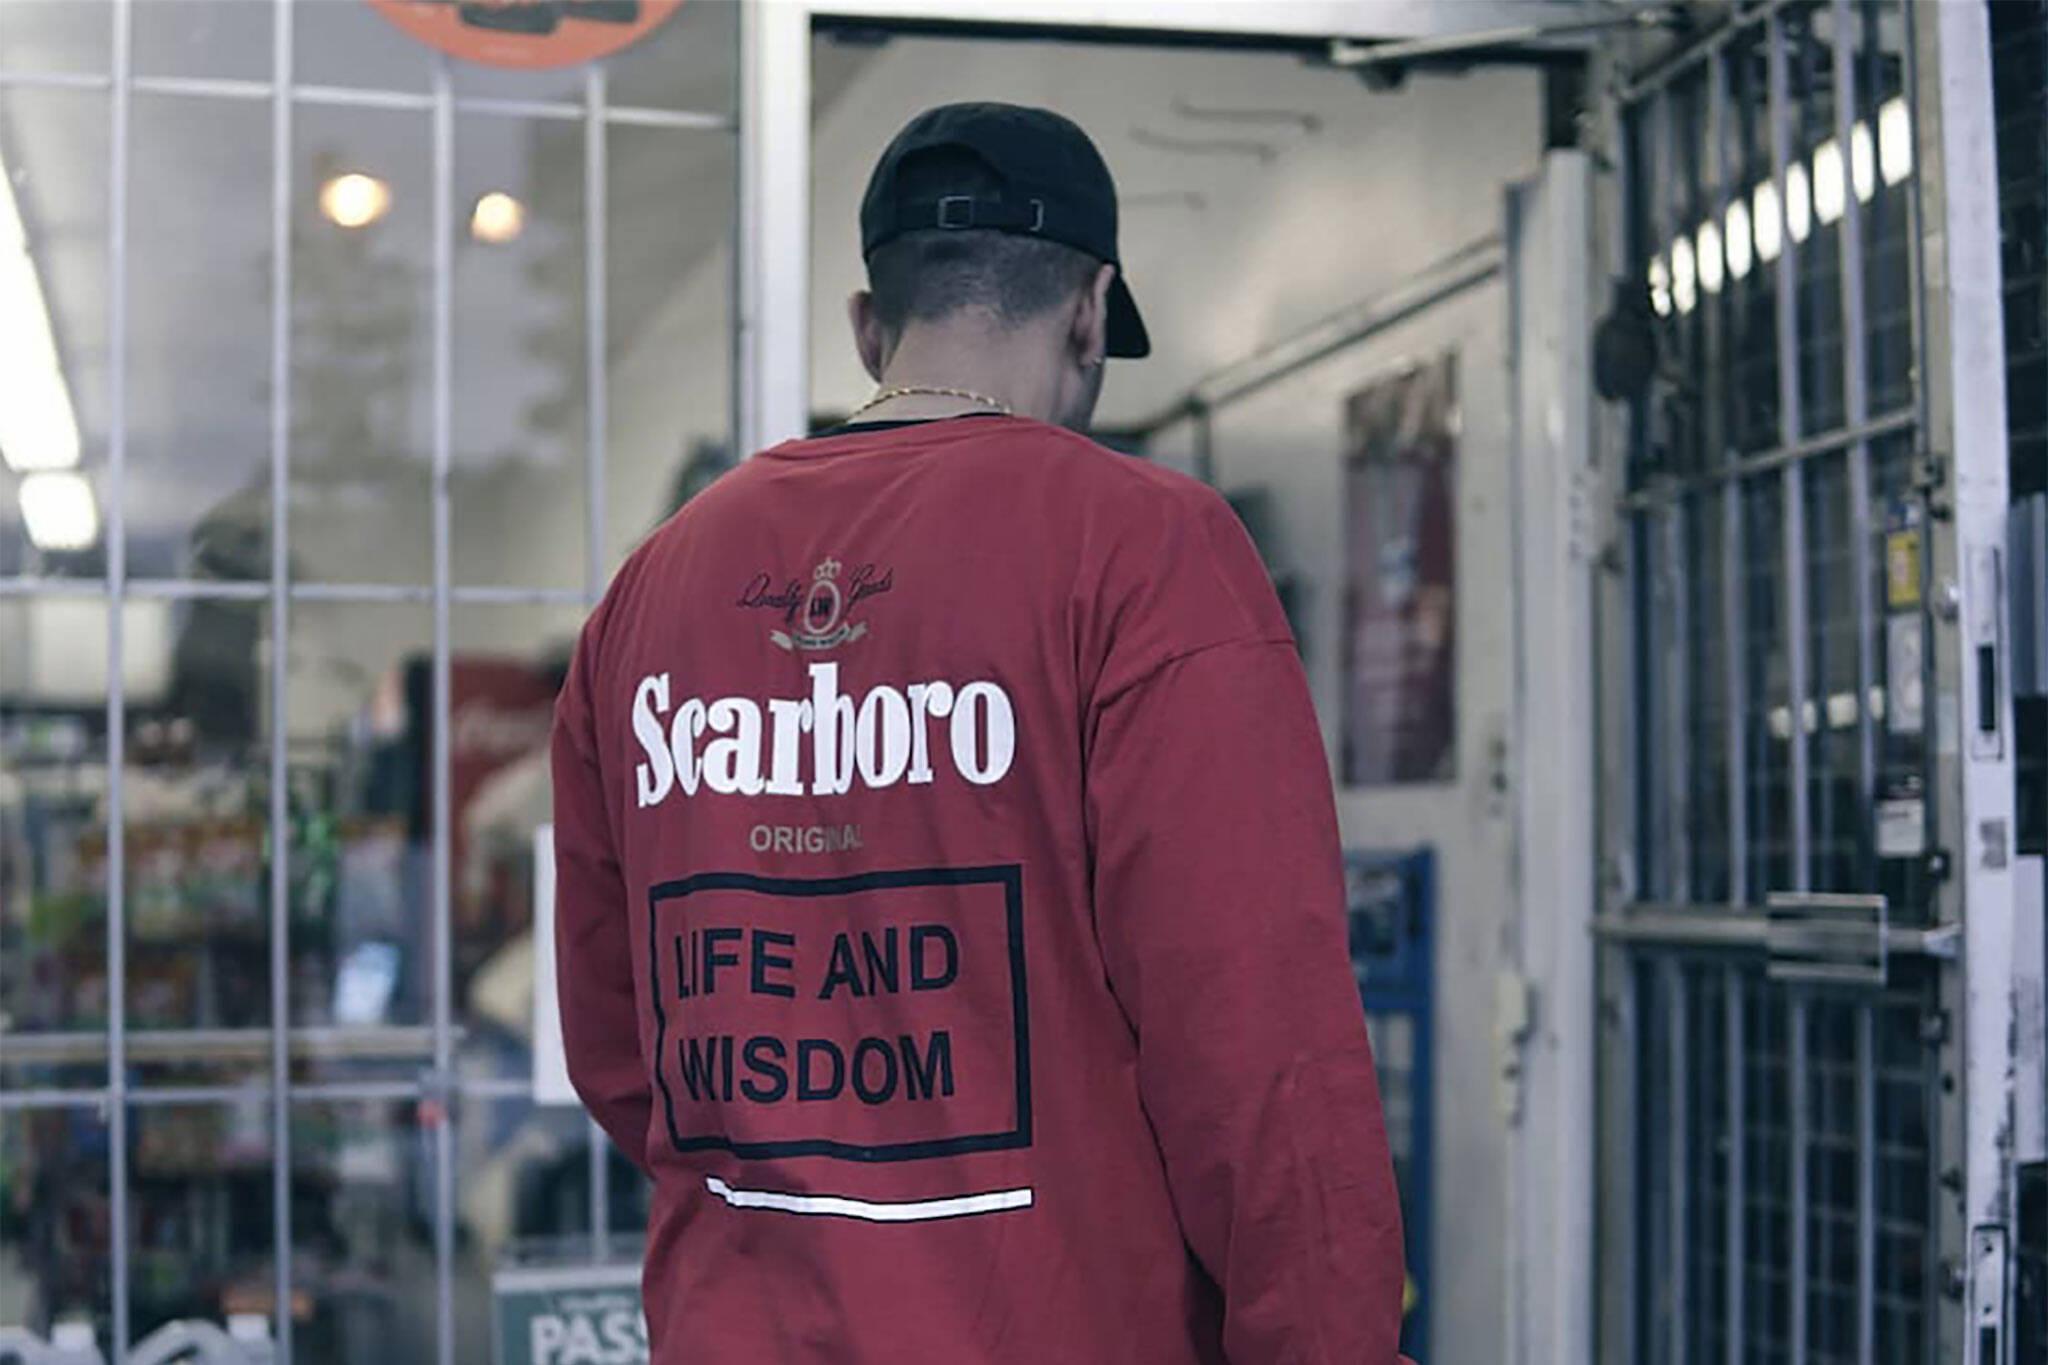 life wisdom clothing